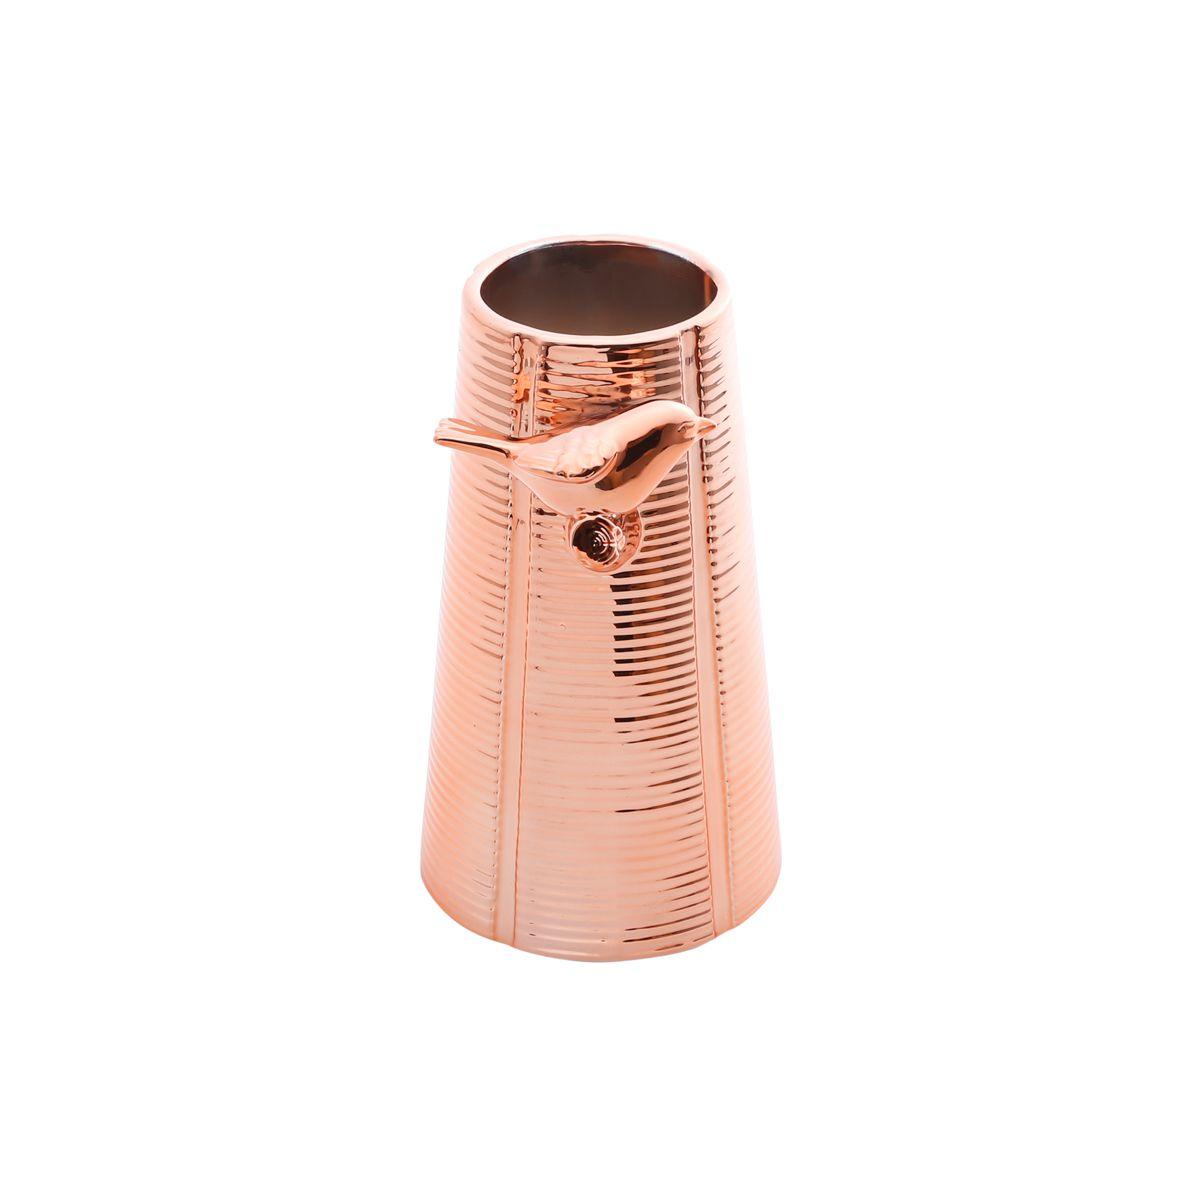 Vaso Cerâmica de Cobre Cromado Bird 9x15cm